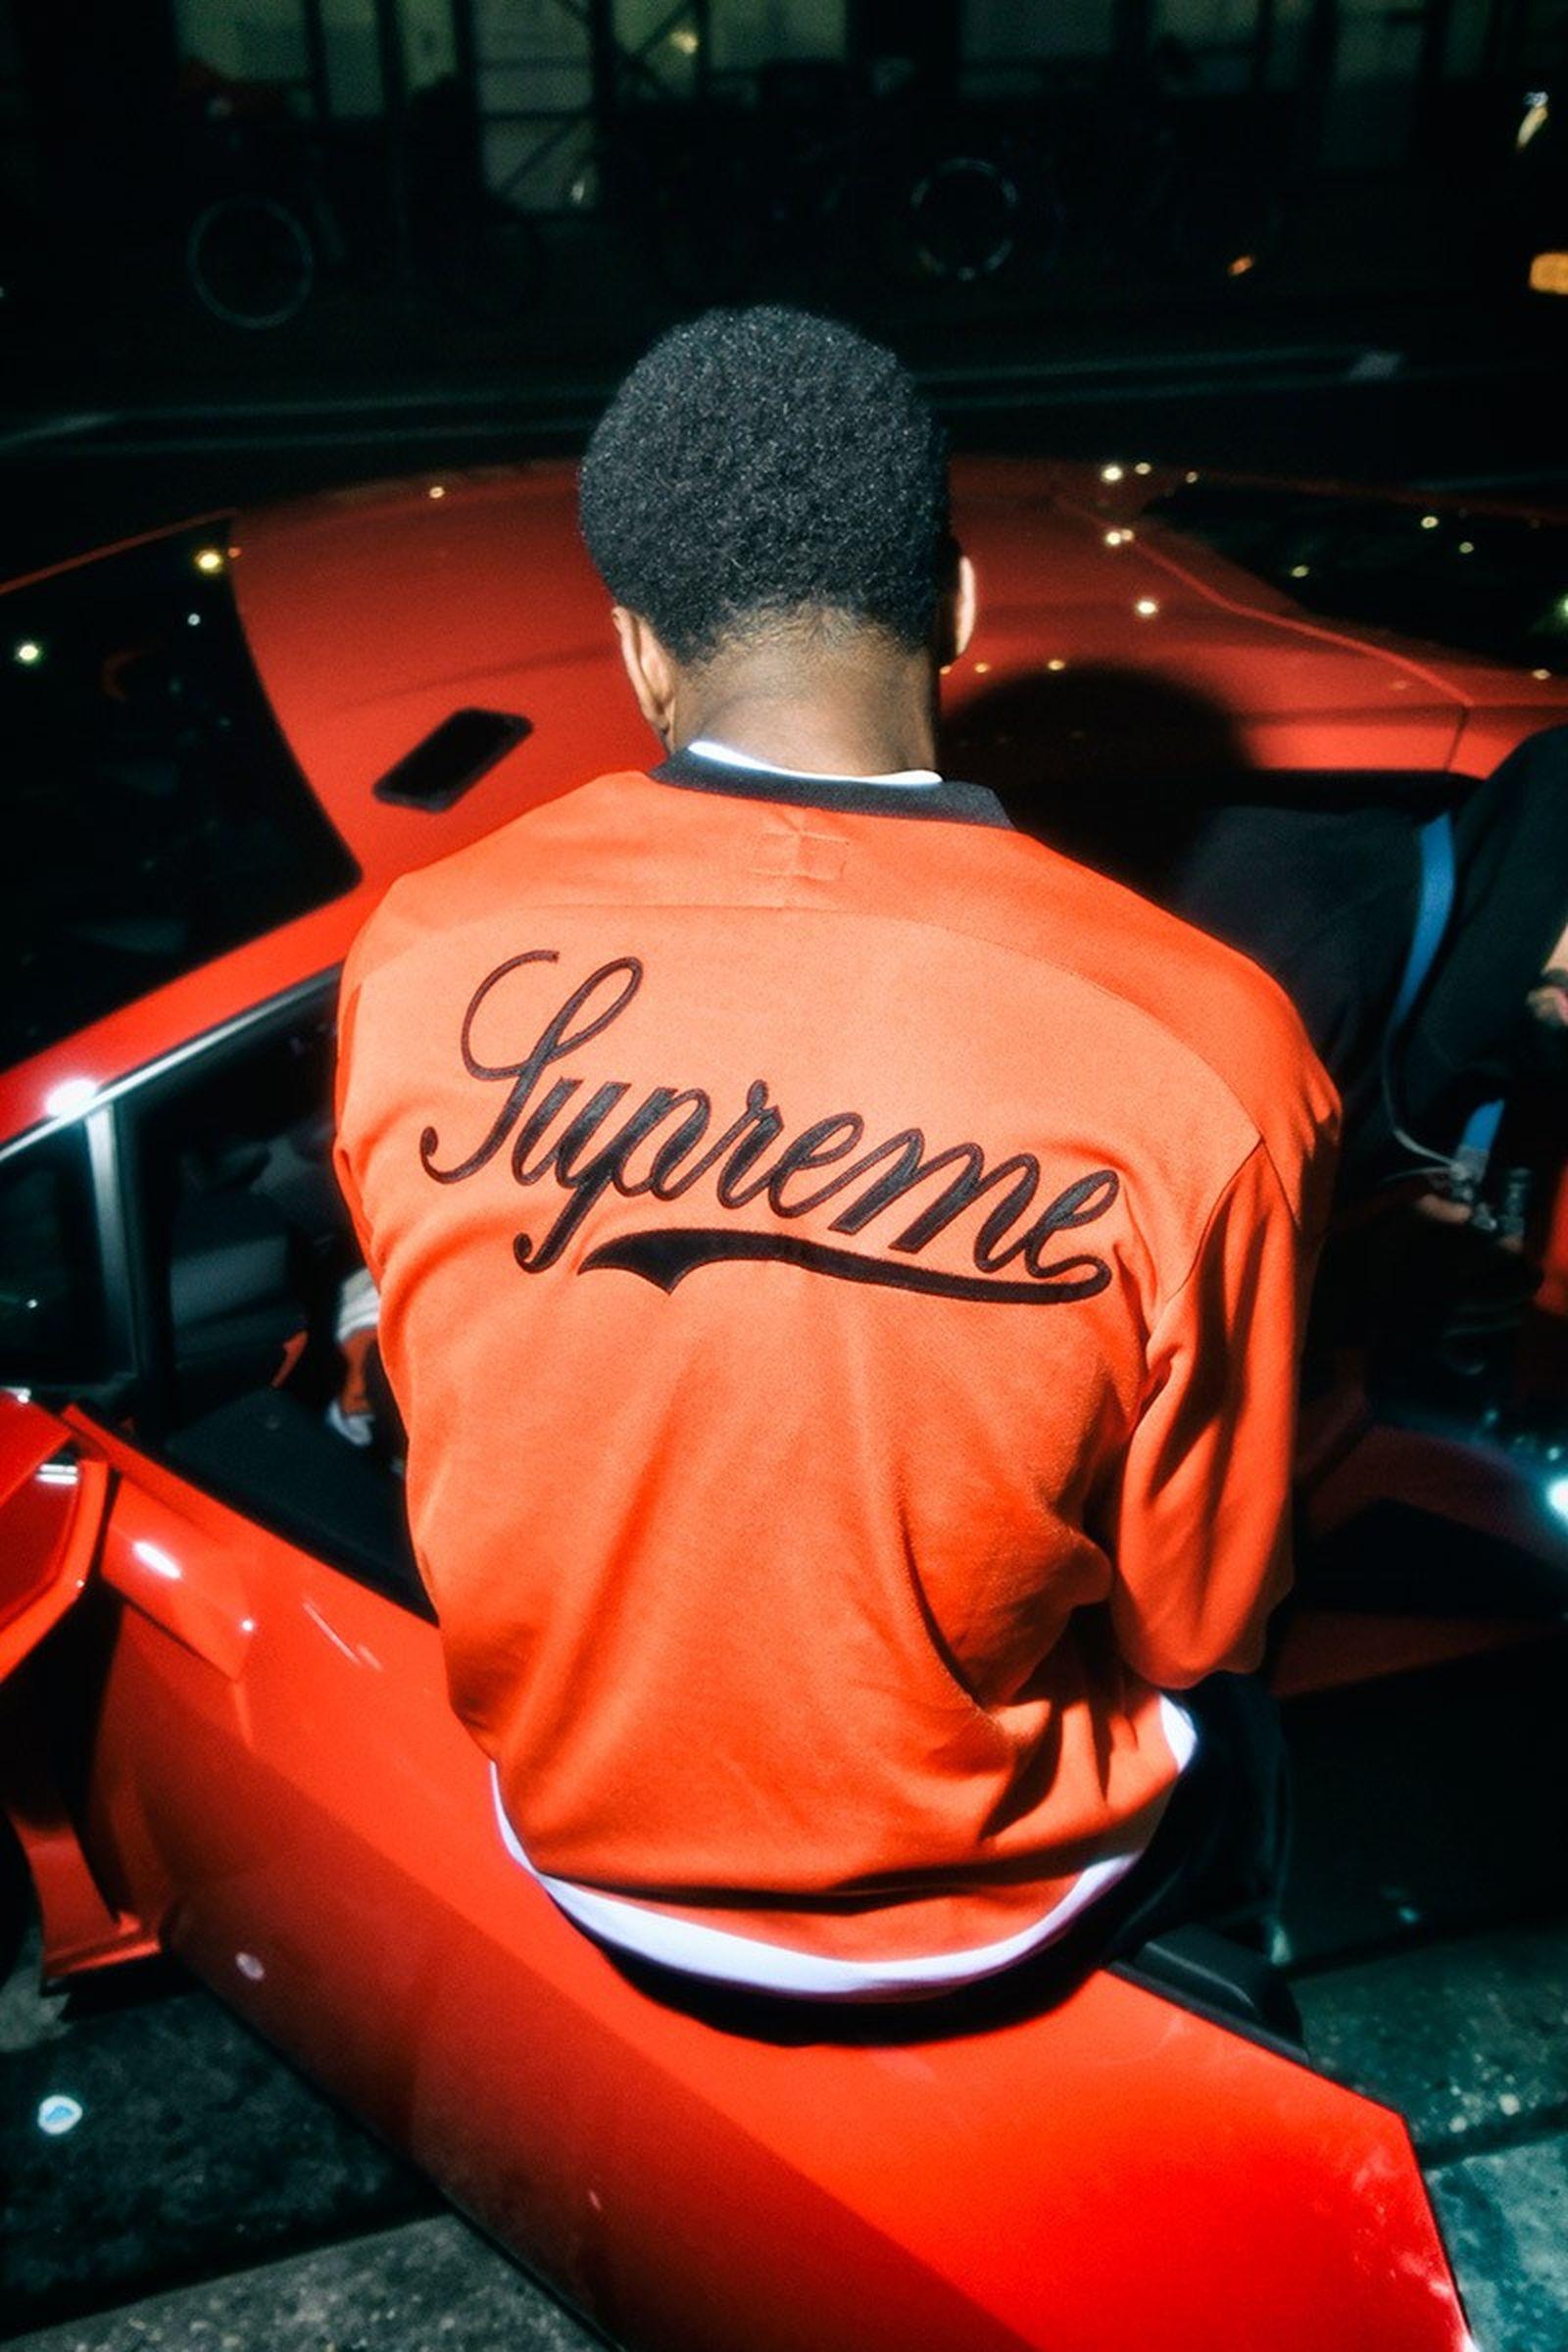 clothes-made-cars-cool-supreme-lamborghini-ss20-collection-05